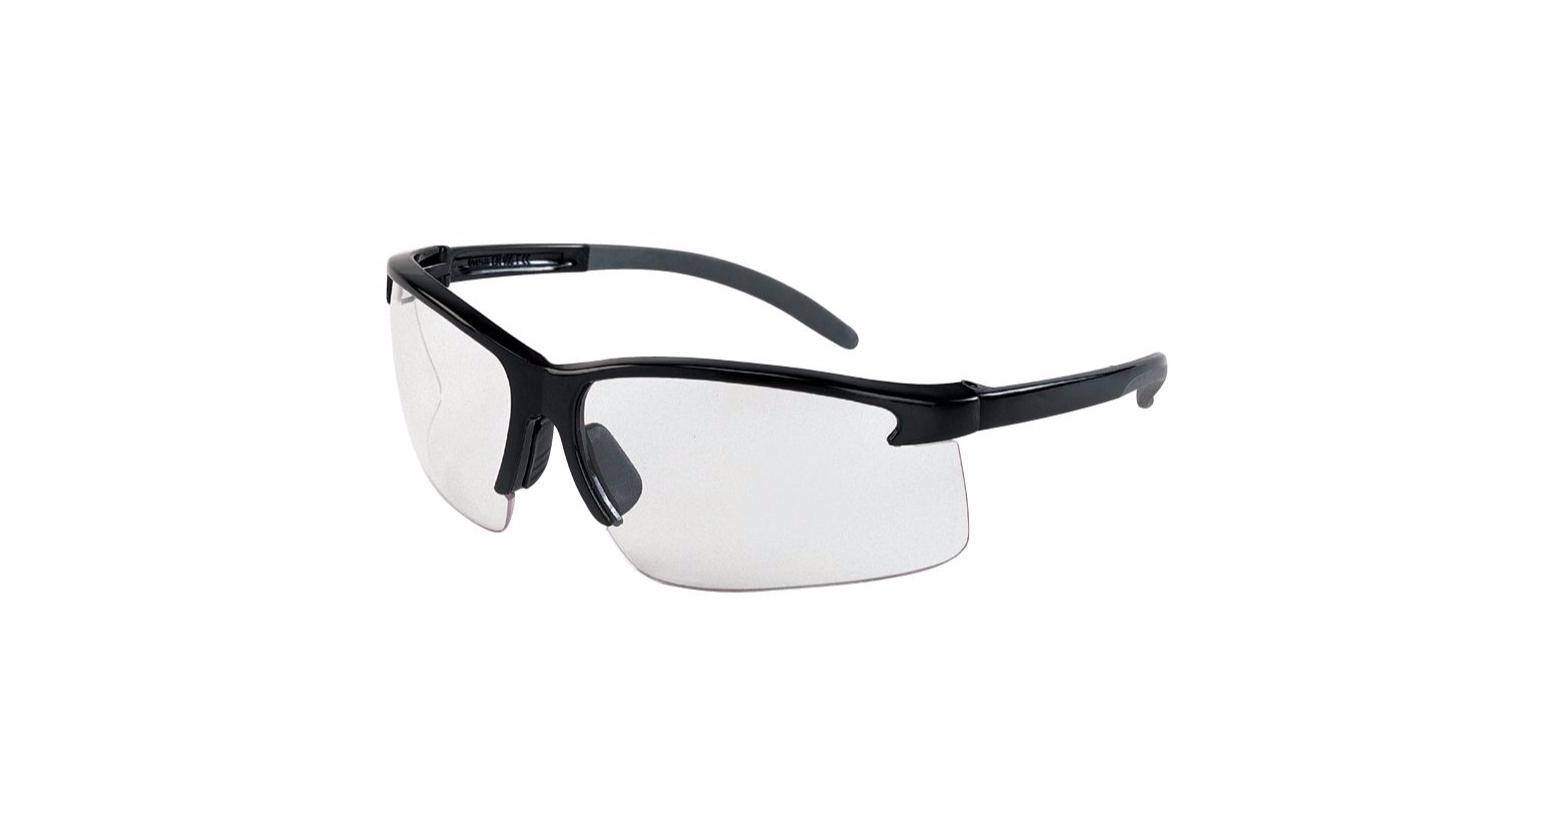 Защитные очки Perspecta 1900  a7e25c09f5b9f